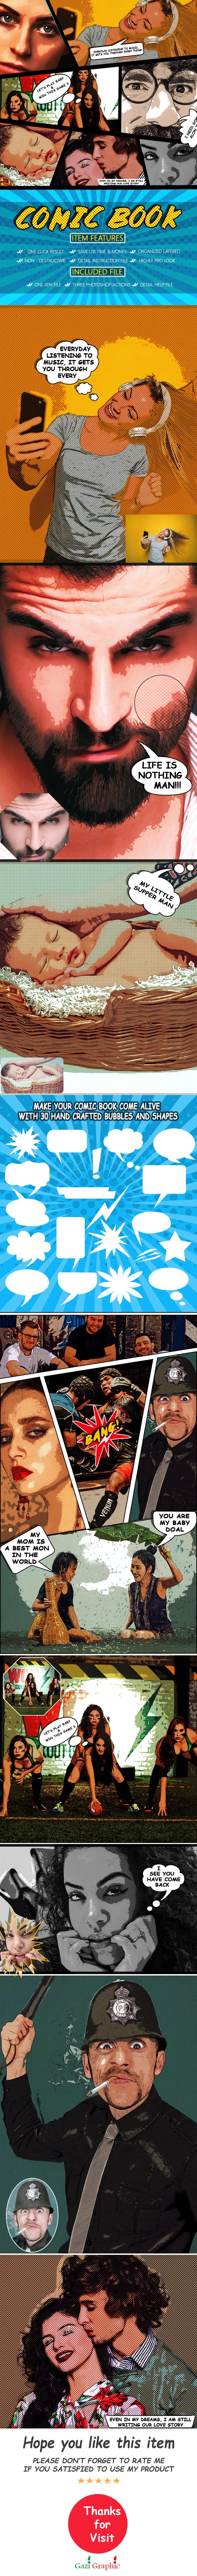 Comic Book Photoshop Action - Actions Photoshop